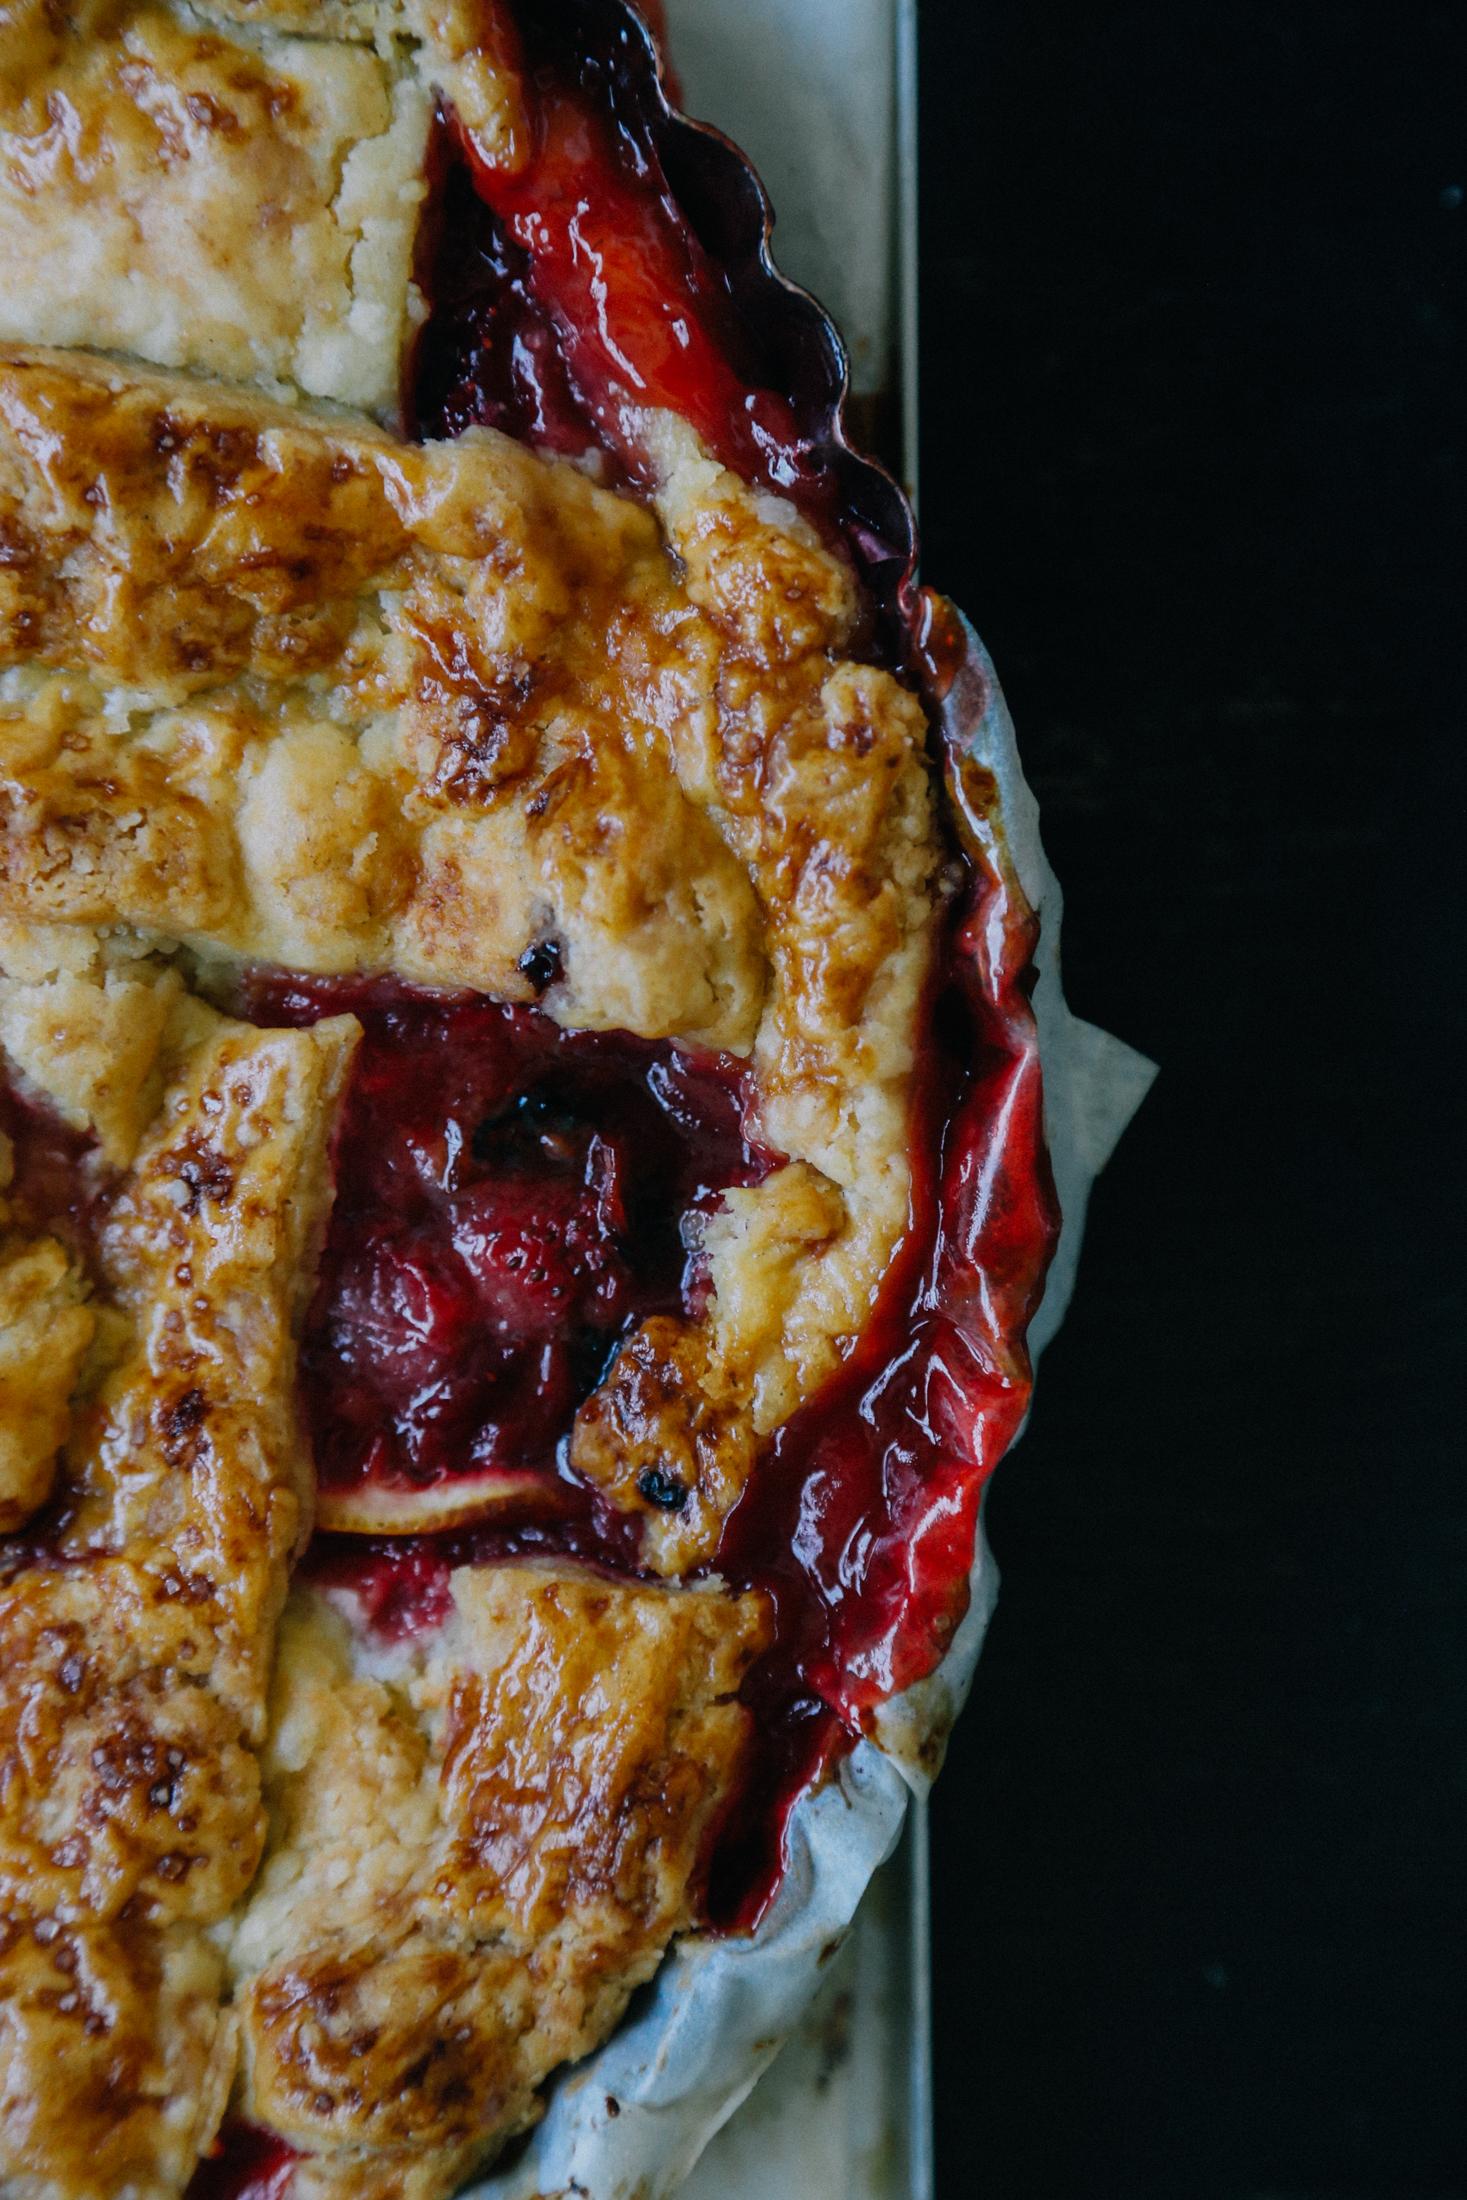 Strawberry and Lemon Pie | Monica R. Goya